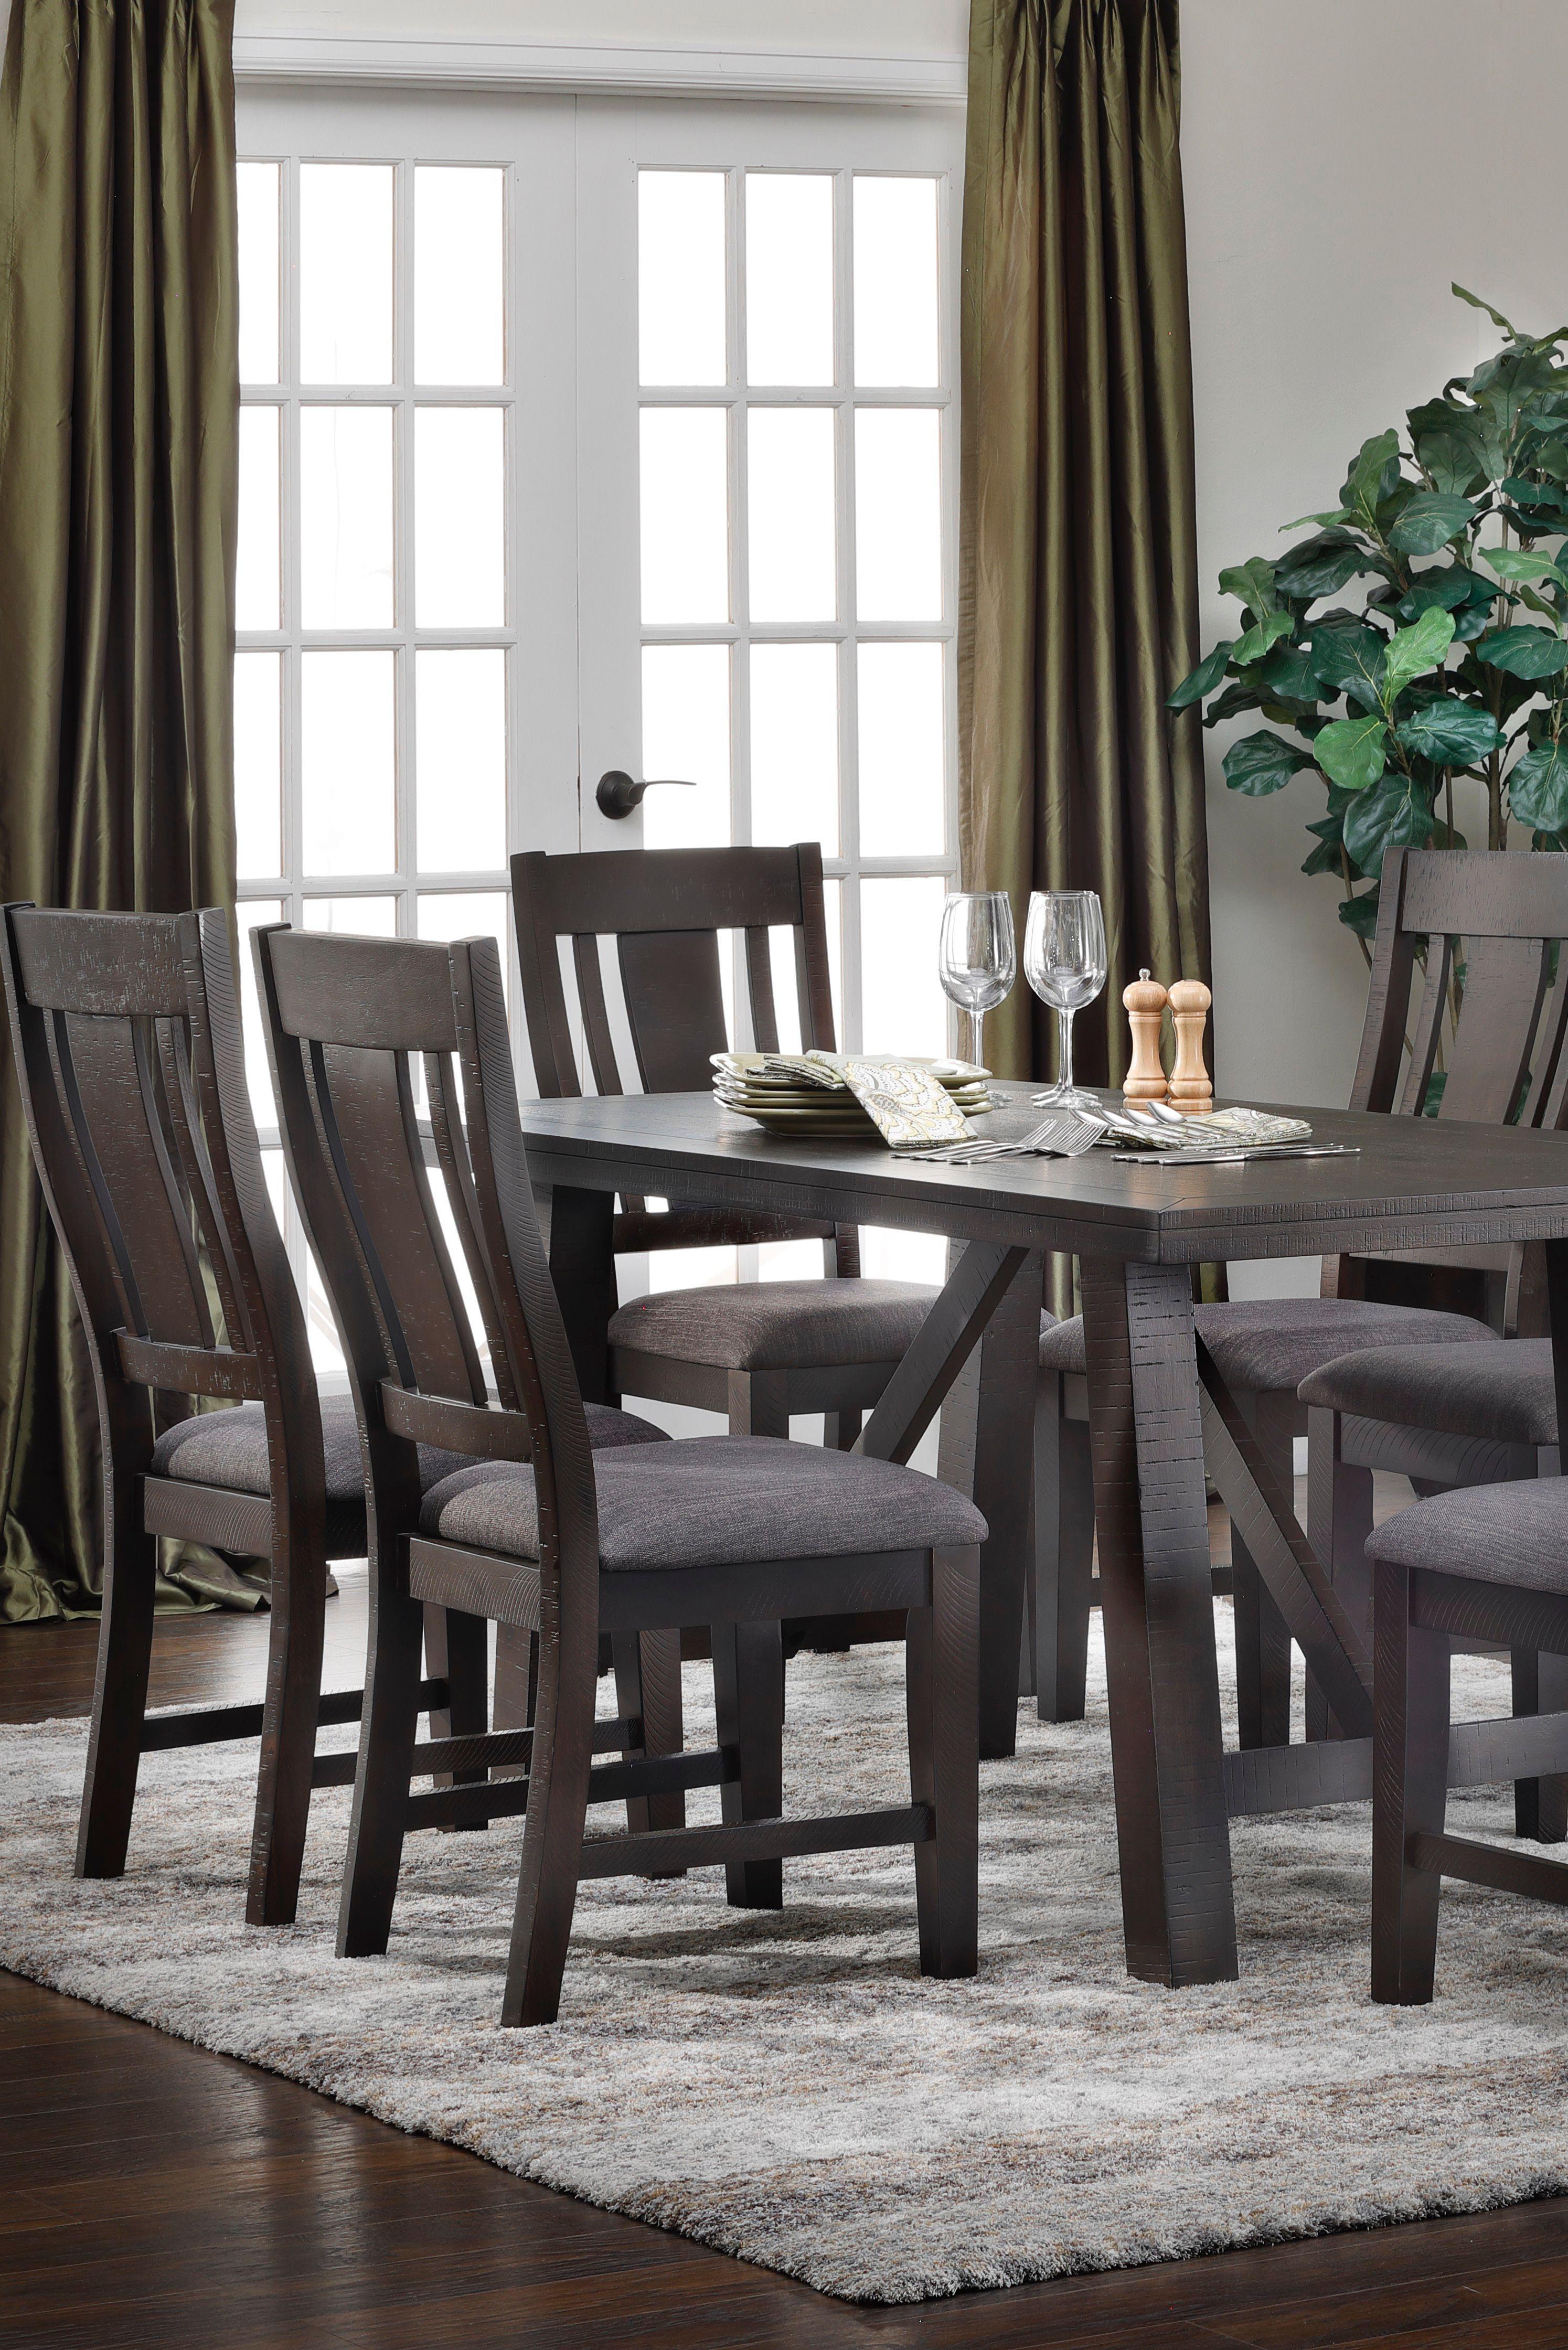 Furniture Row Black Friday Granada Dining Set Wooden Dining